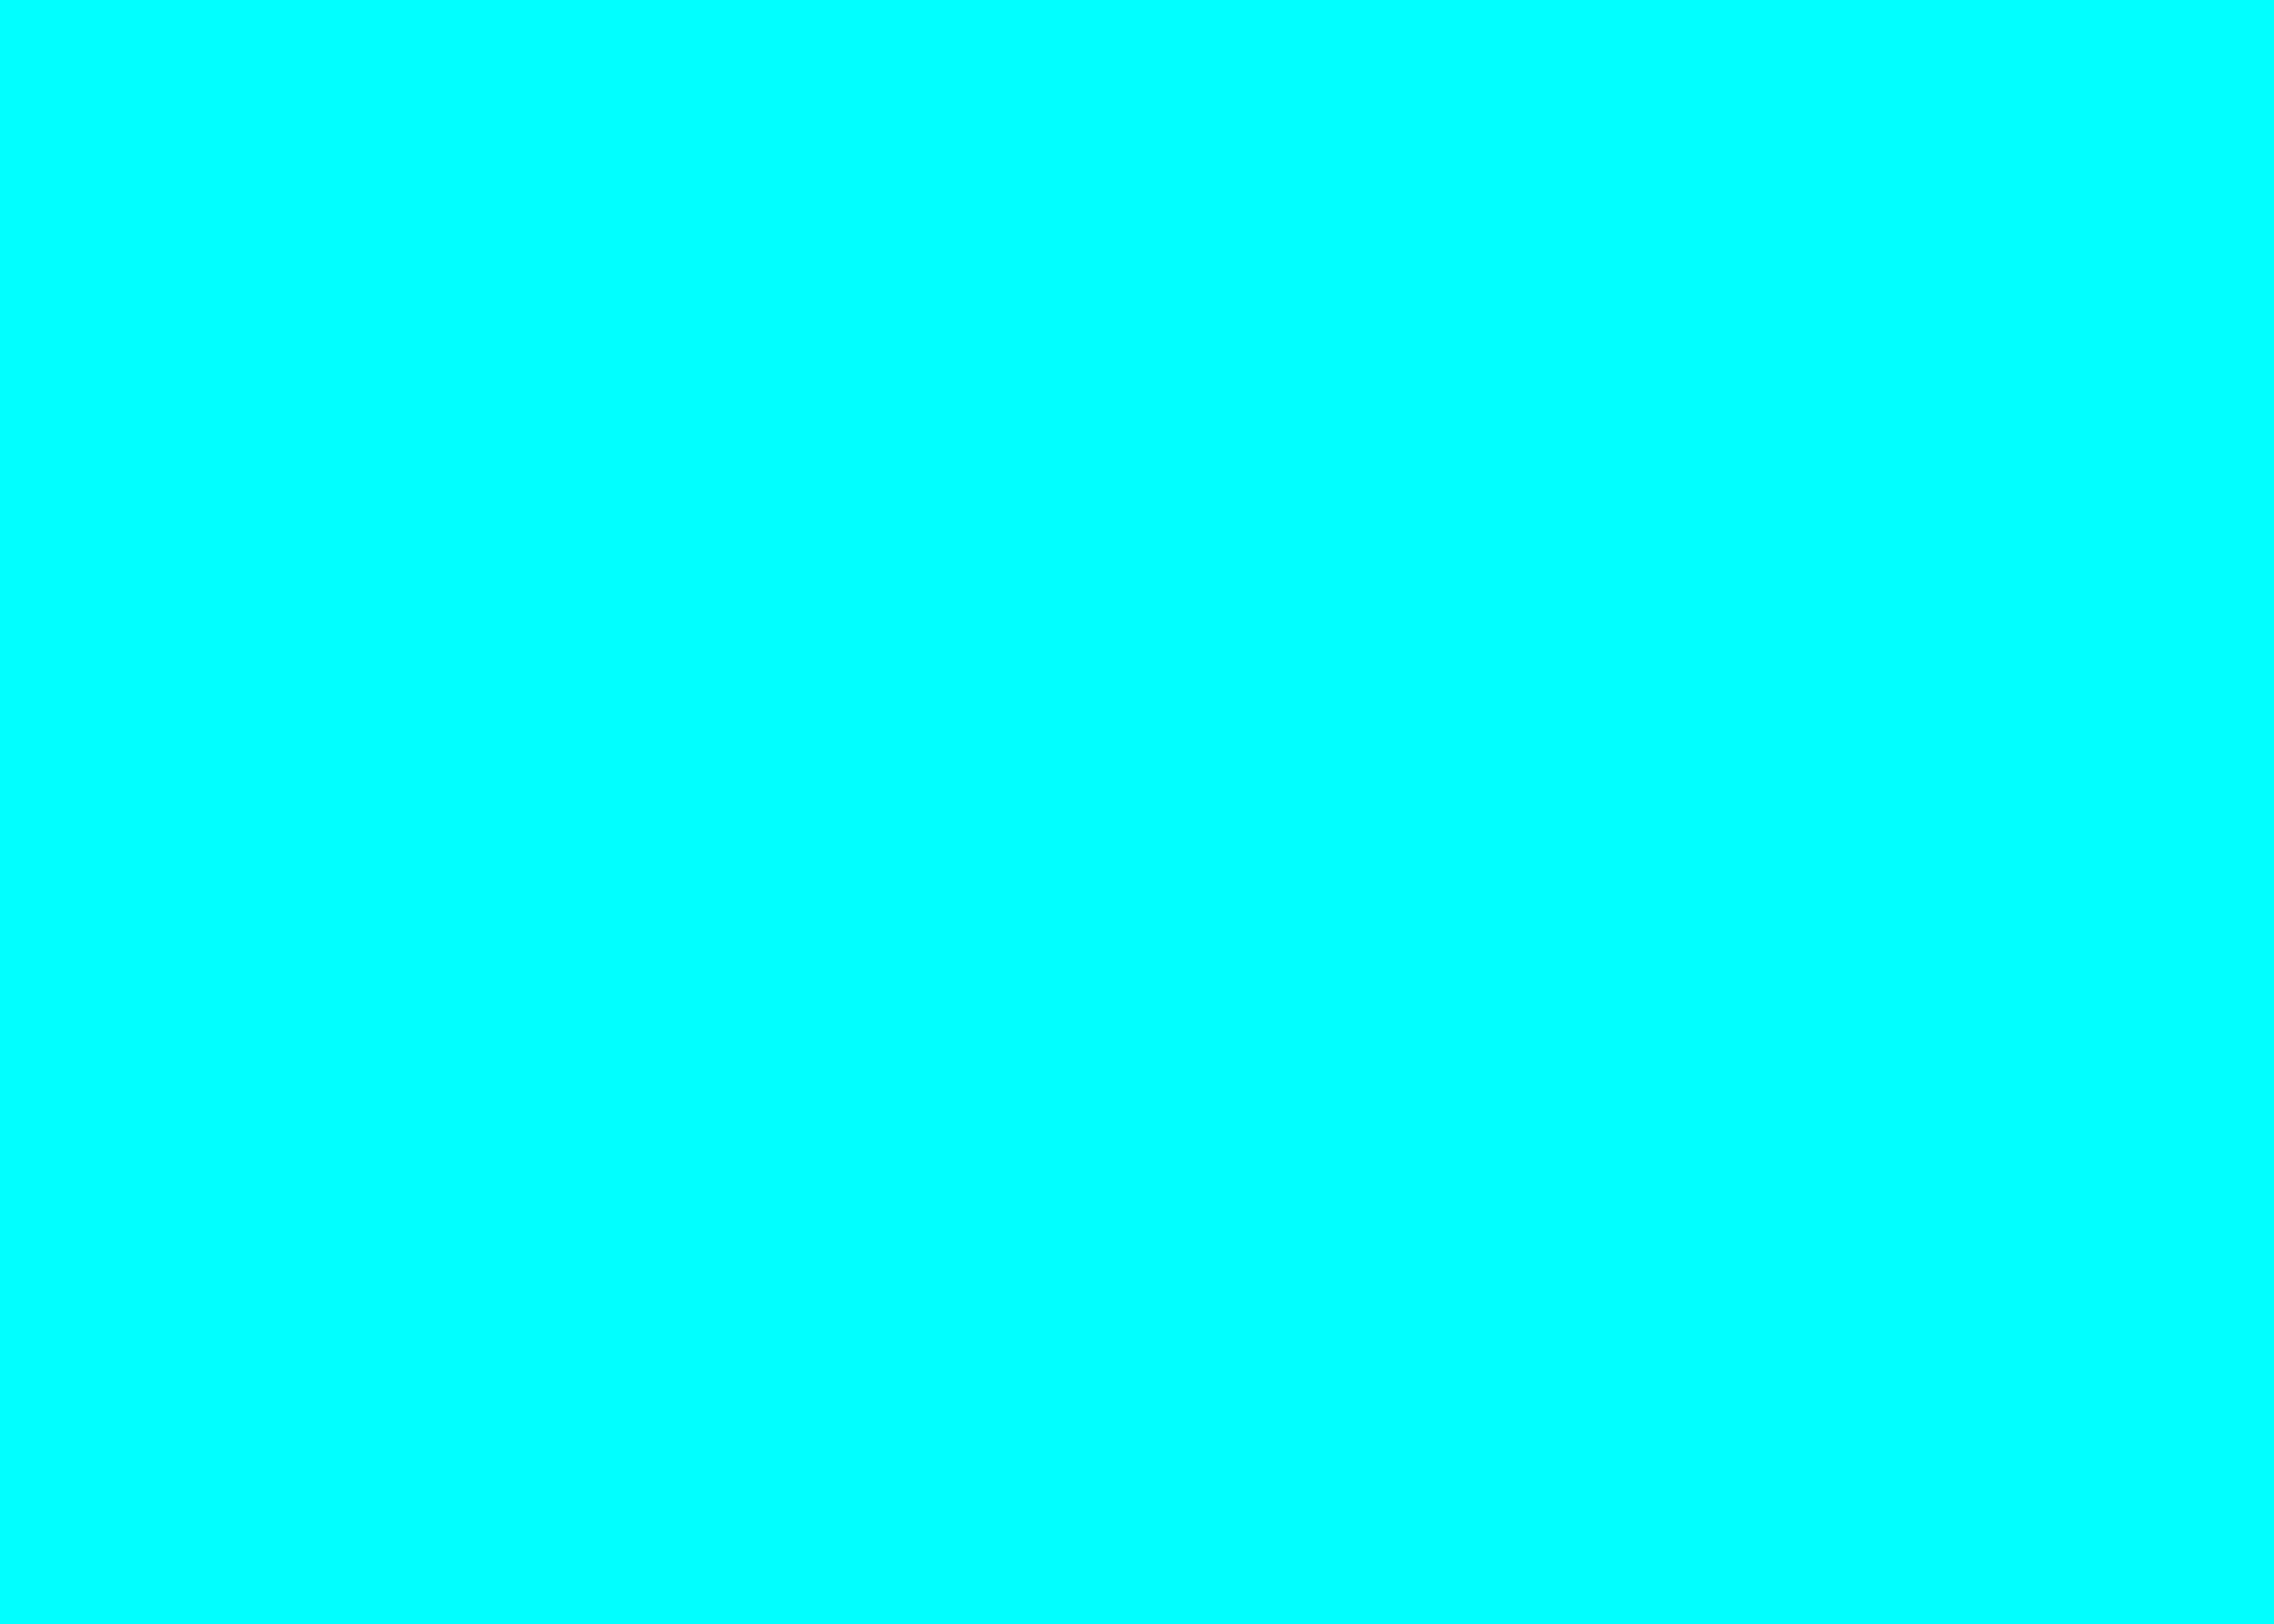 Aqua Color Coordinates Hex Triplet 00ffff Srgbb R G B 0 255 255 Source Ht Sherwin Williams Paint Colors Green Paint Colors Blue Paint Colors